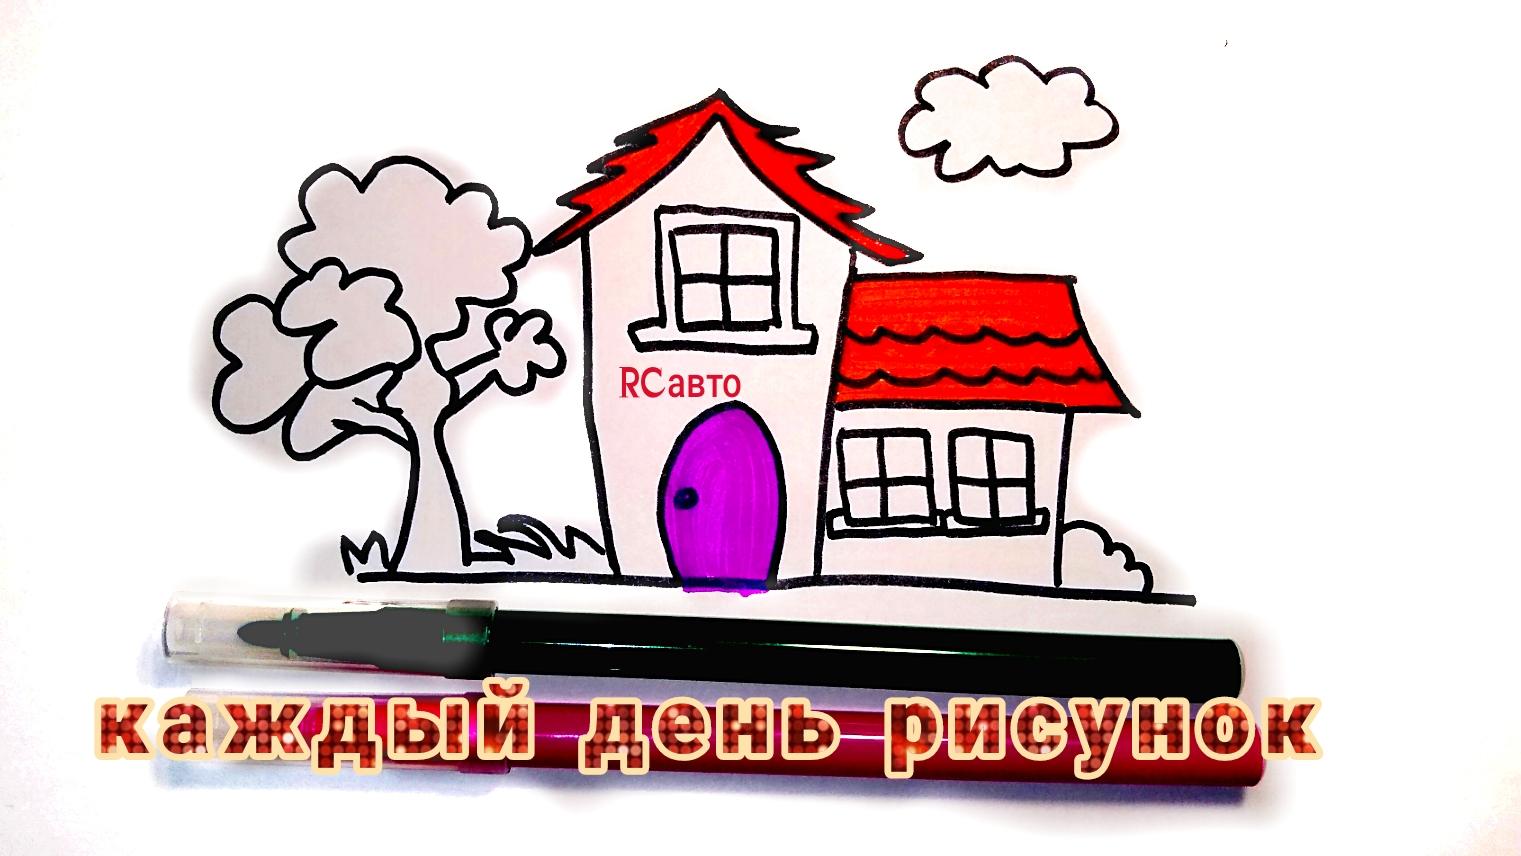 Как нарисовать ДОМ / how to draw Draw a HOUSE / рисунки для срисовки